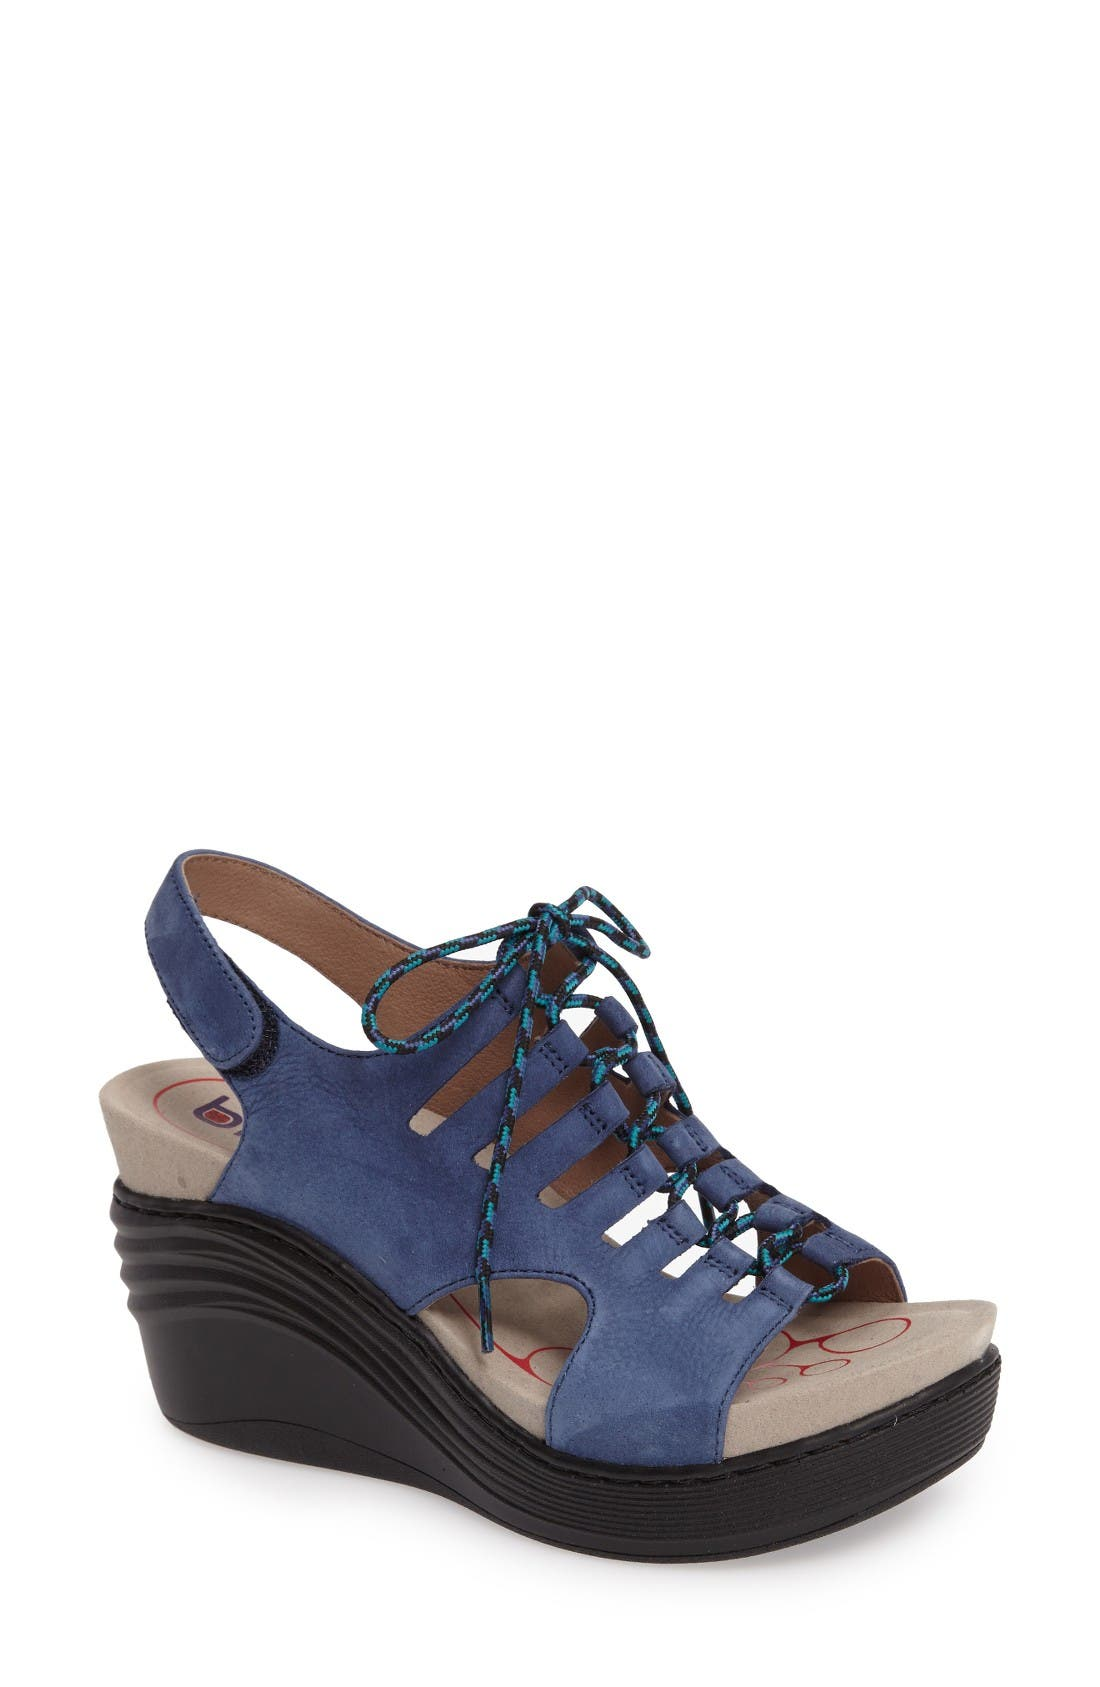 BIONICA Sirus Wedge Sandal